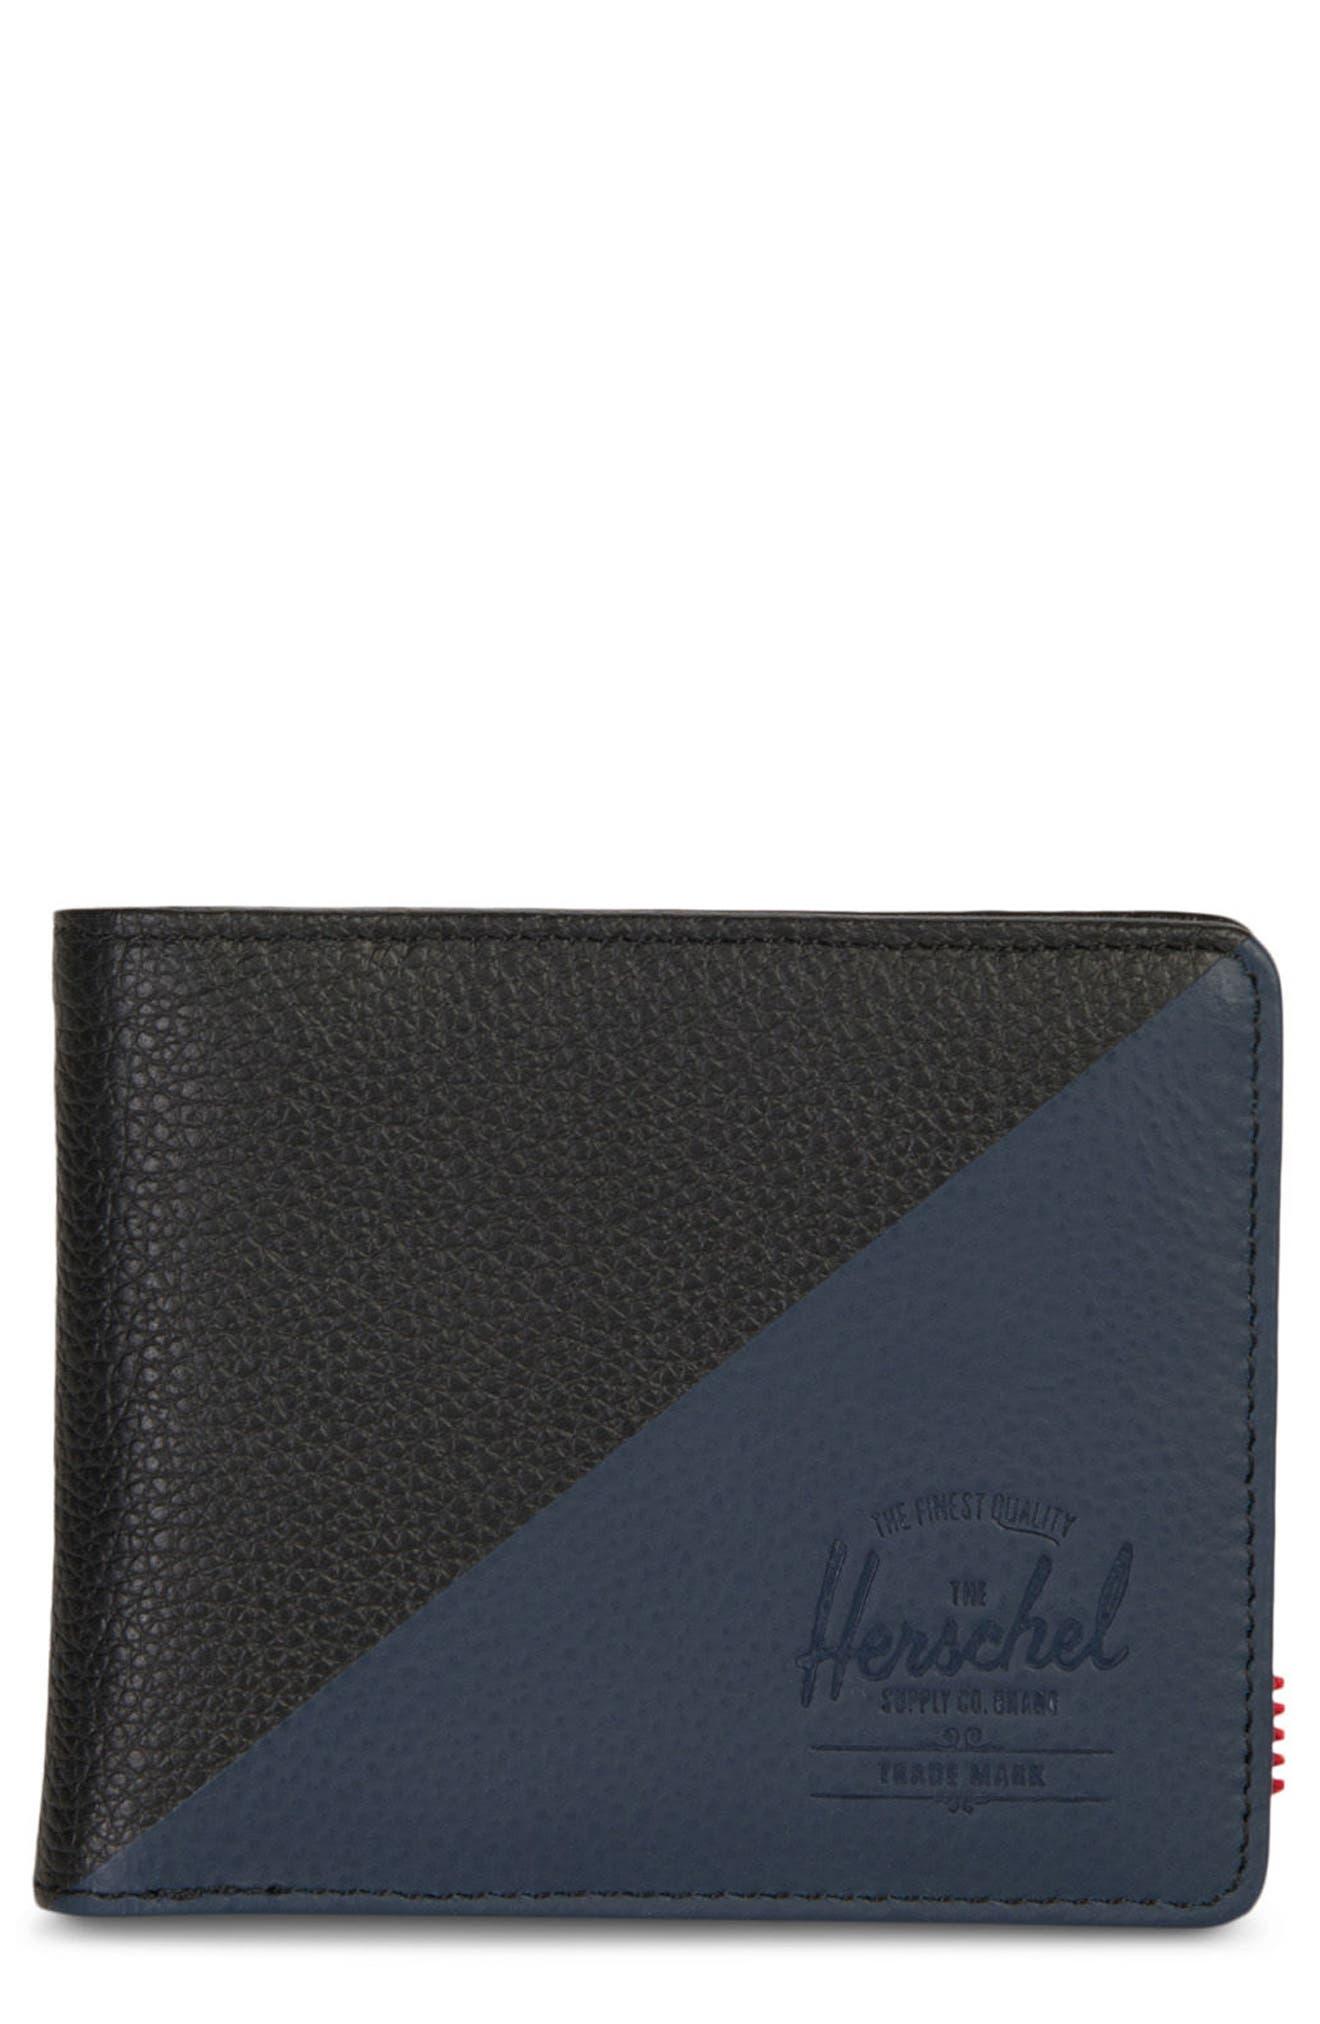 Hank Leather Wallet,                         Main,                         color, Black